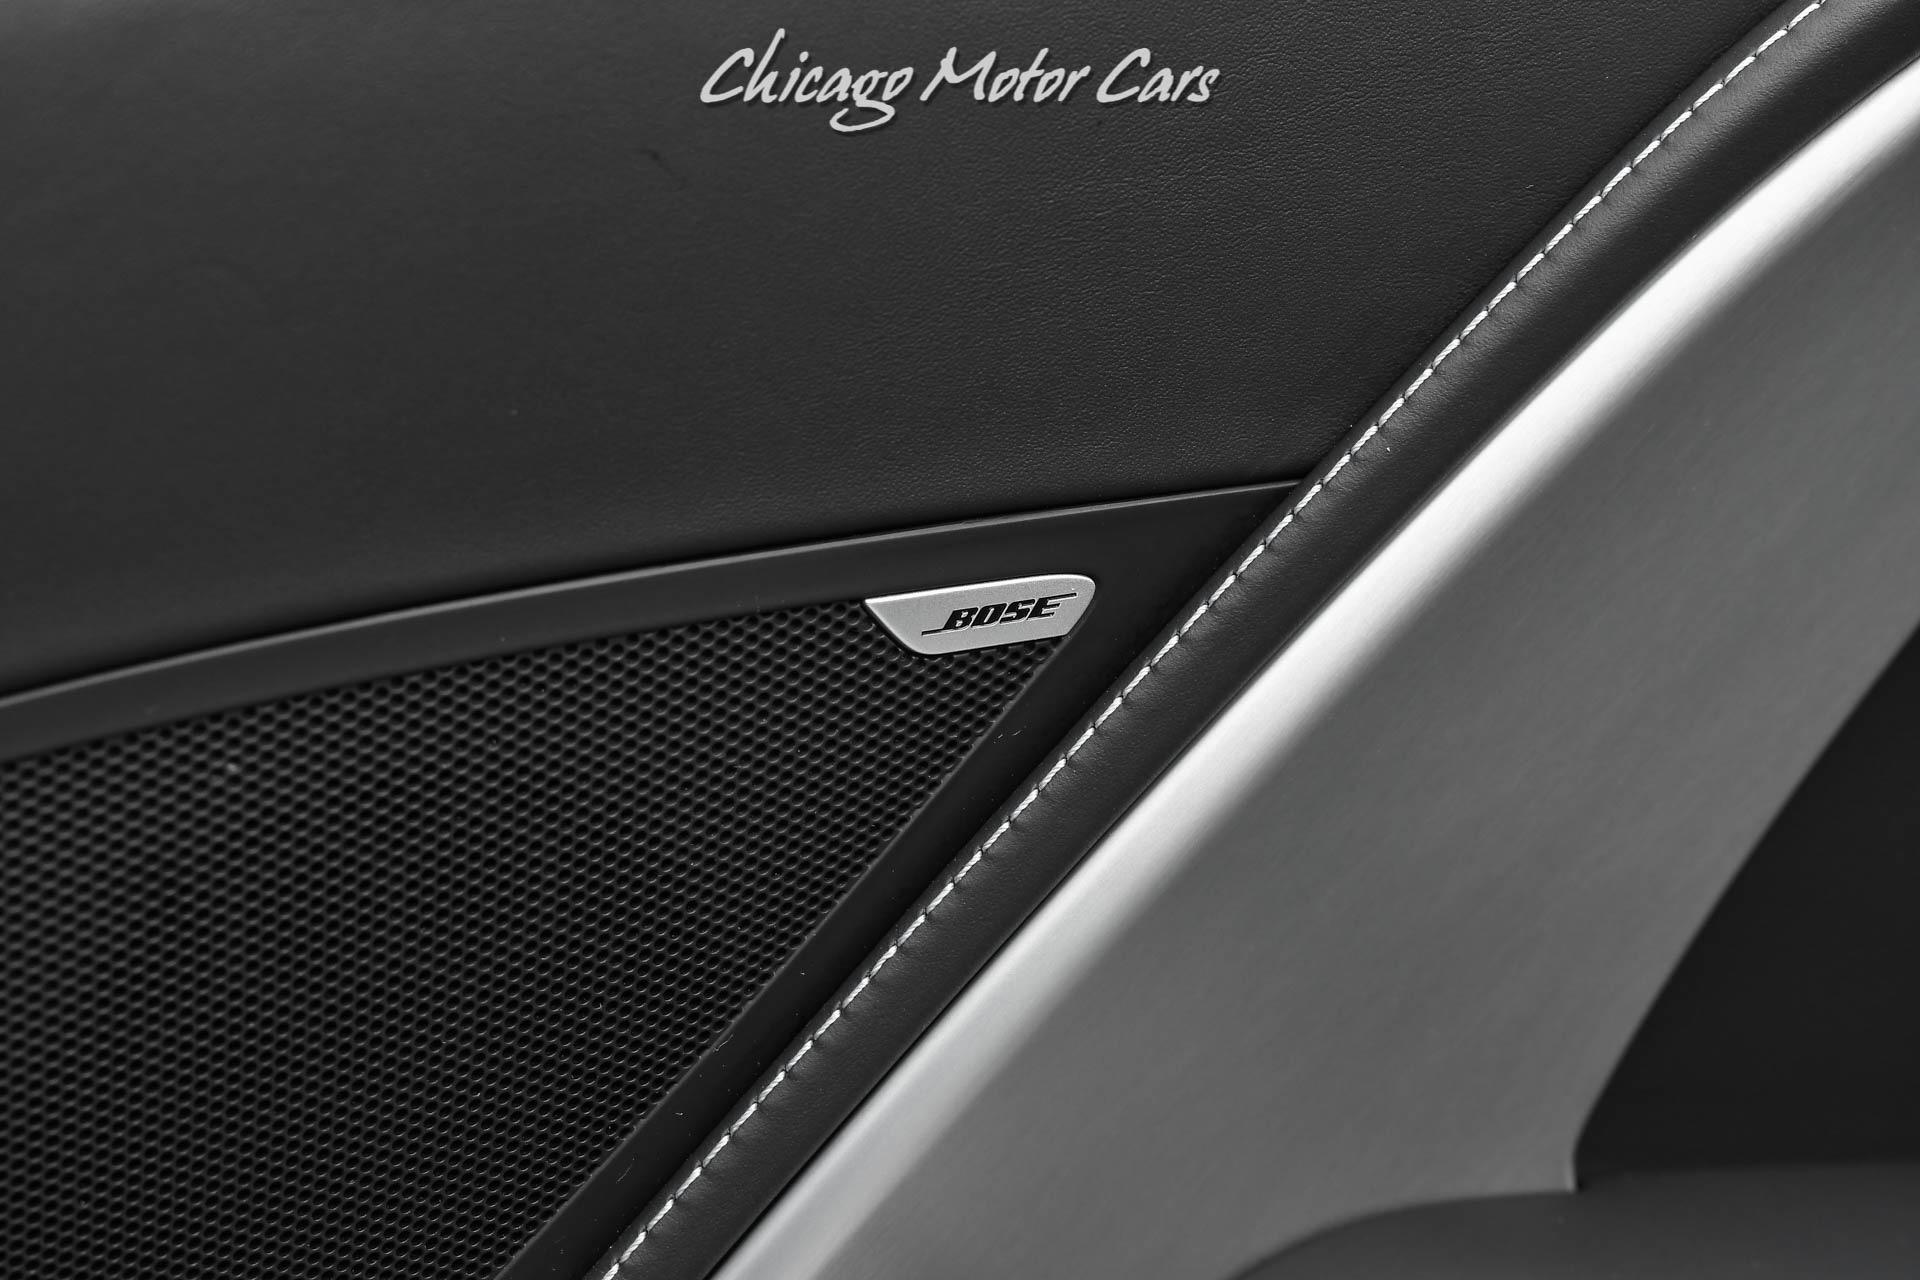 Used-2019-Chevrolet-Corvette-ZR1-3ZR-Coupe-1200HP-MONSTER-9-SEC-CAR